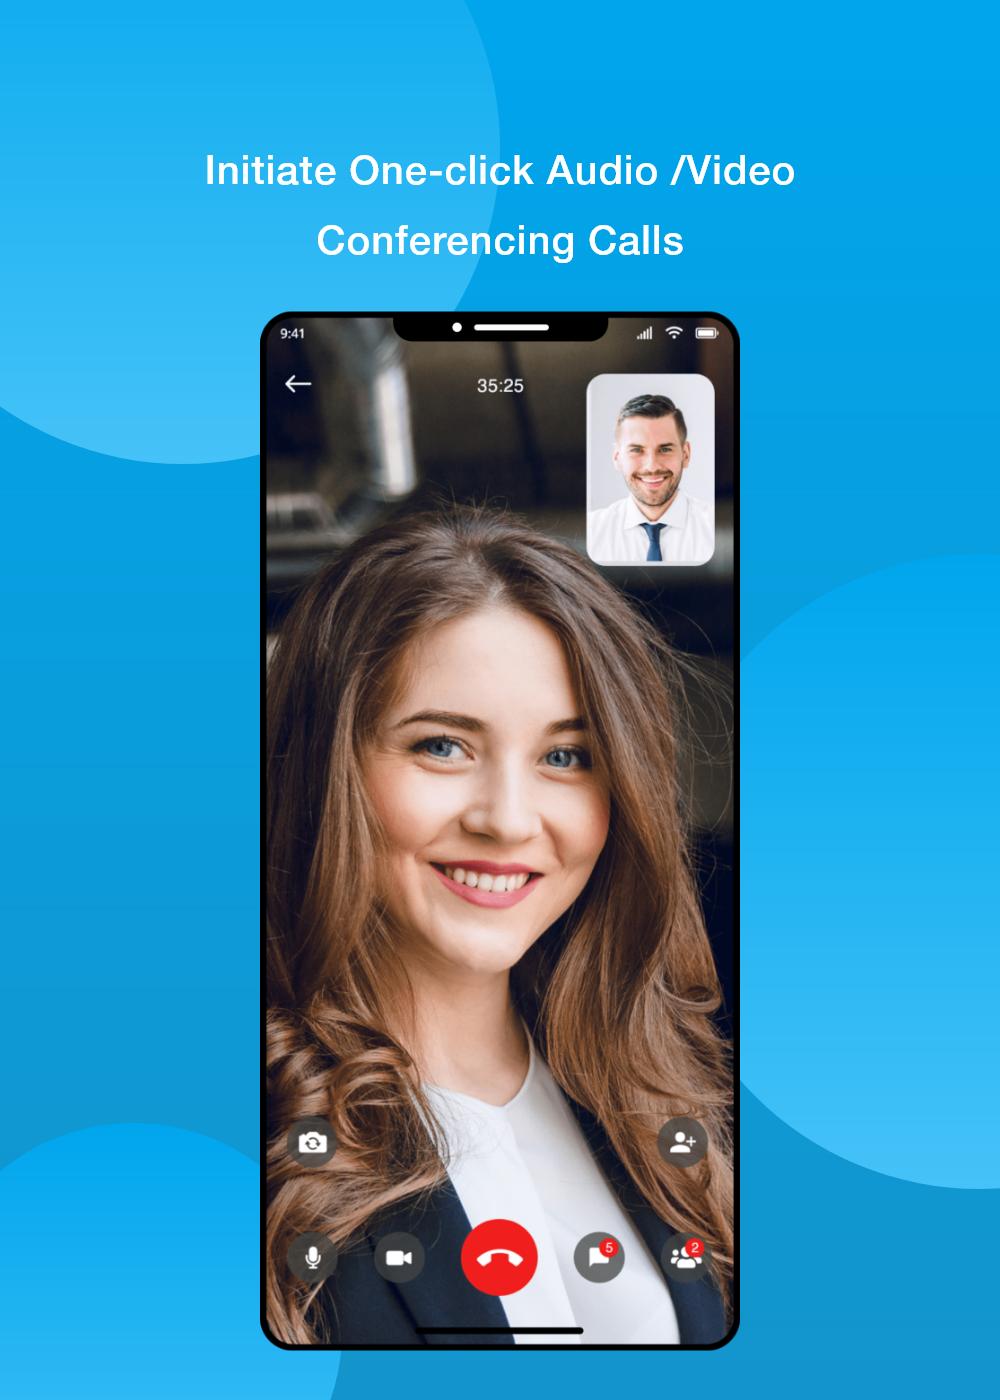 Initiate One-click audio/video conferencing calls